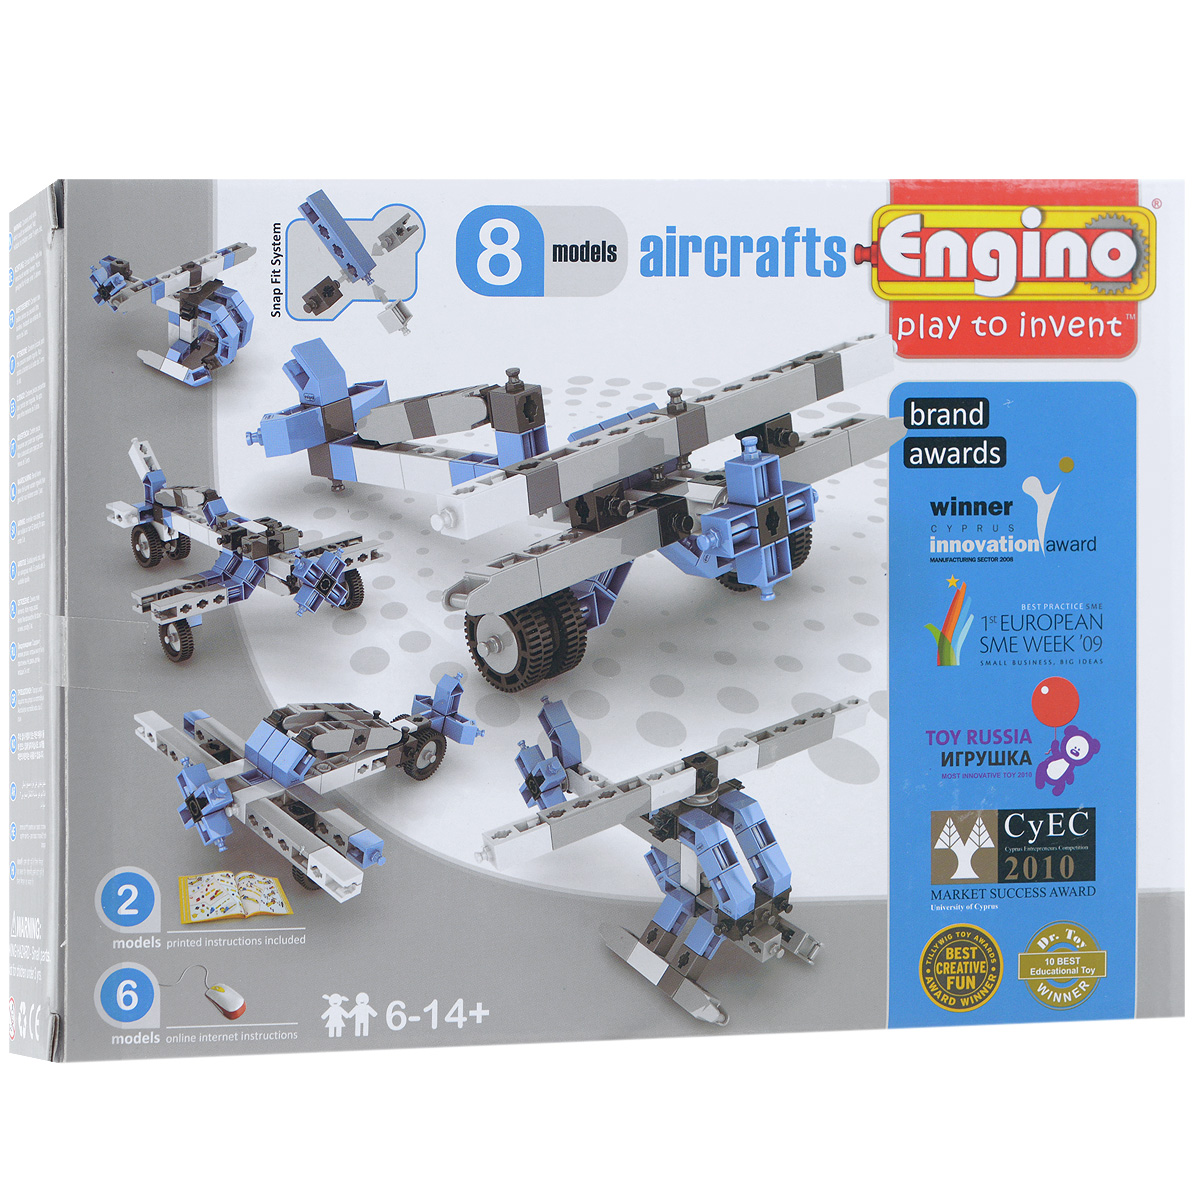 Engino Конструктор  Aircrafts 8 models overlord маруяма куганэ мп3 аудиокнига том 8 скачать